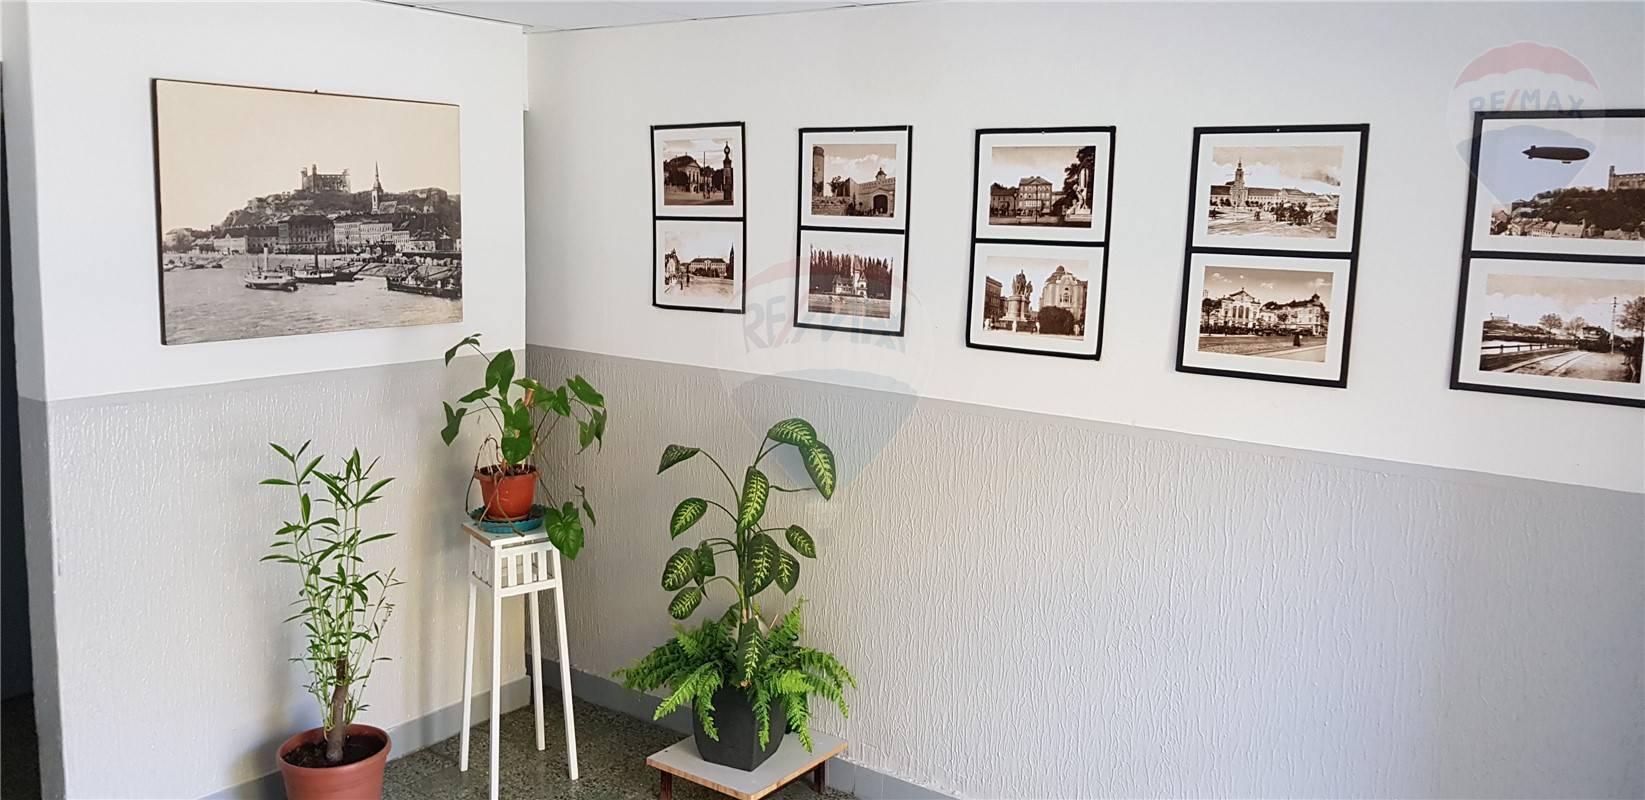 Predaj bytu (2 izbový) 52 m2, Bratislava - Dúbravka -